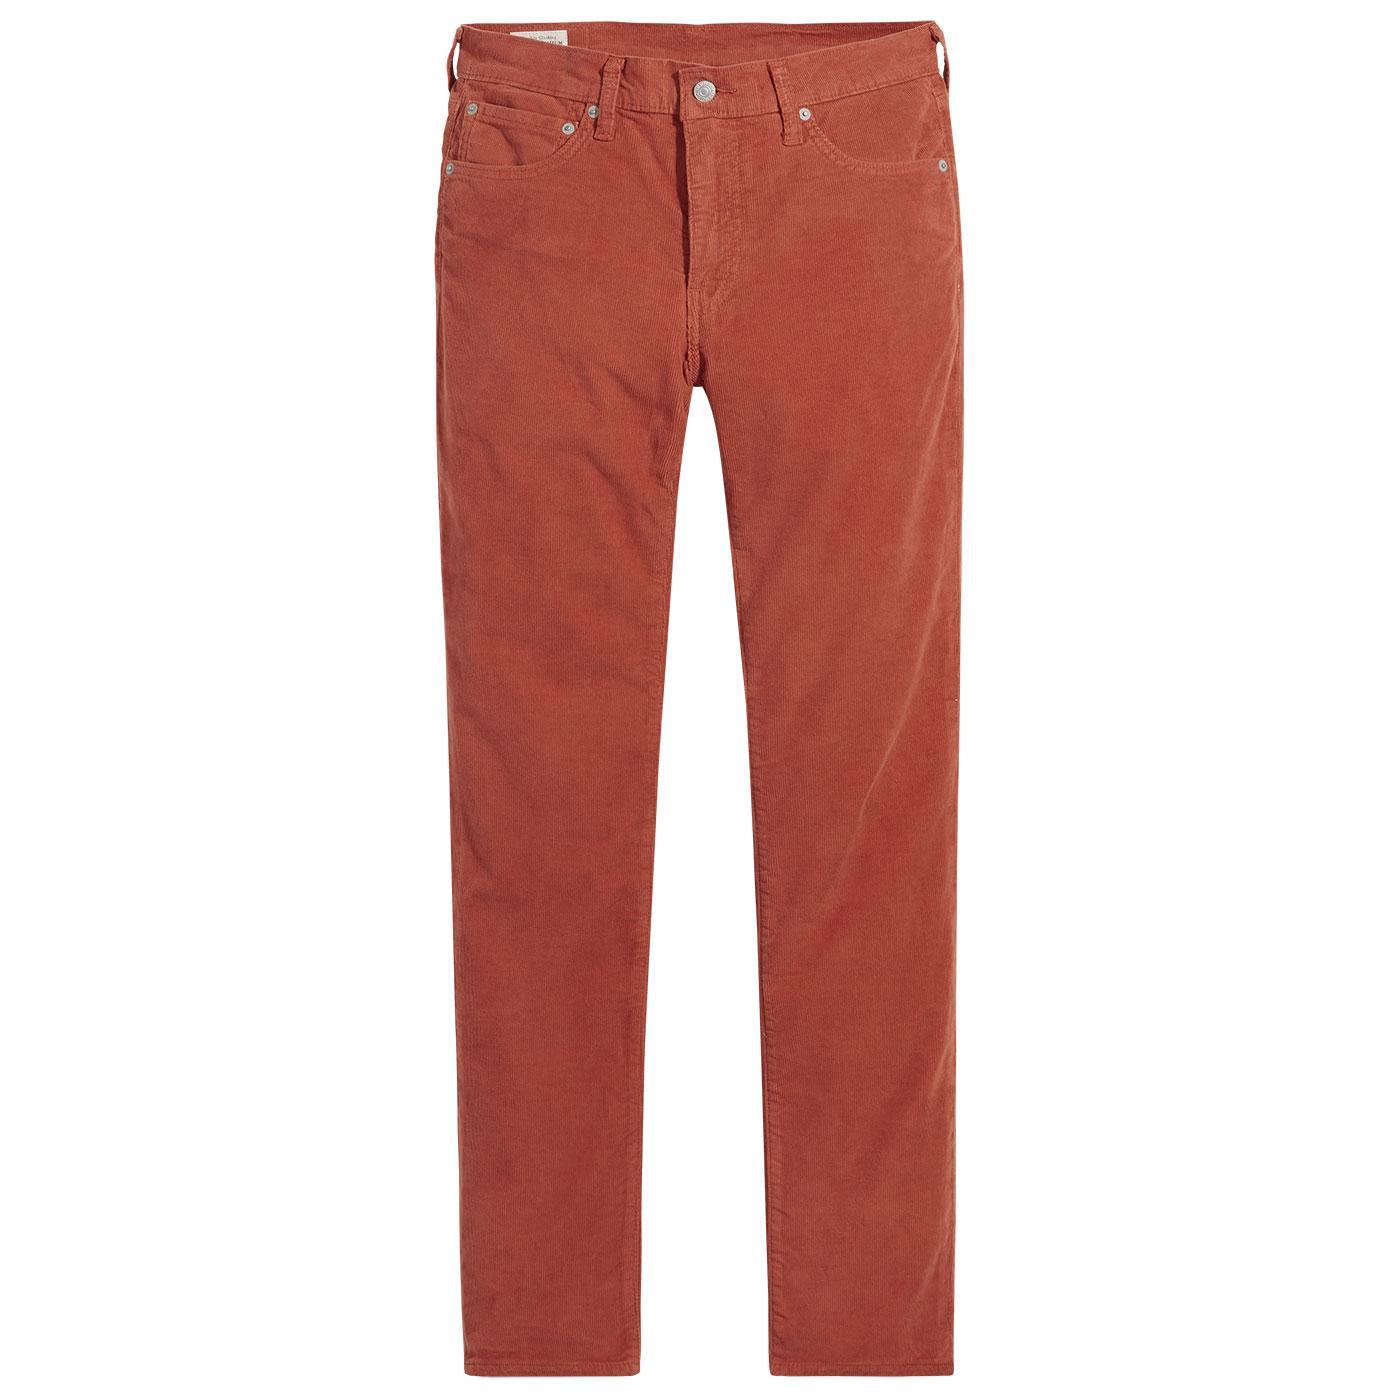 LEVI'S 511 Slim 14W Cord Retro Mod Trousers (BB)